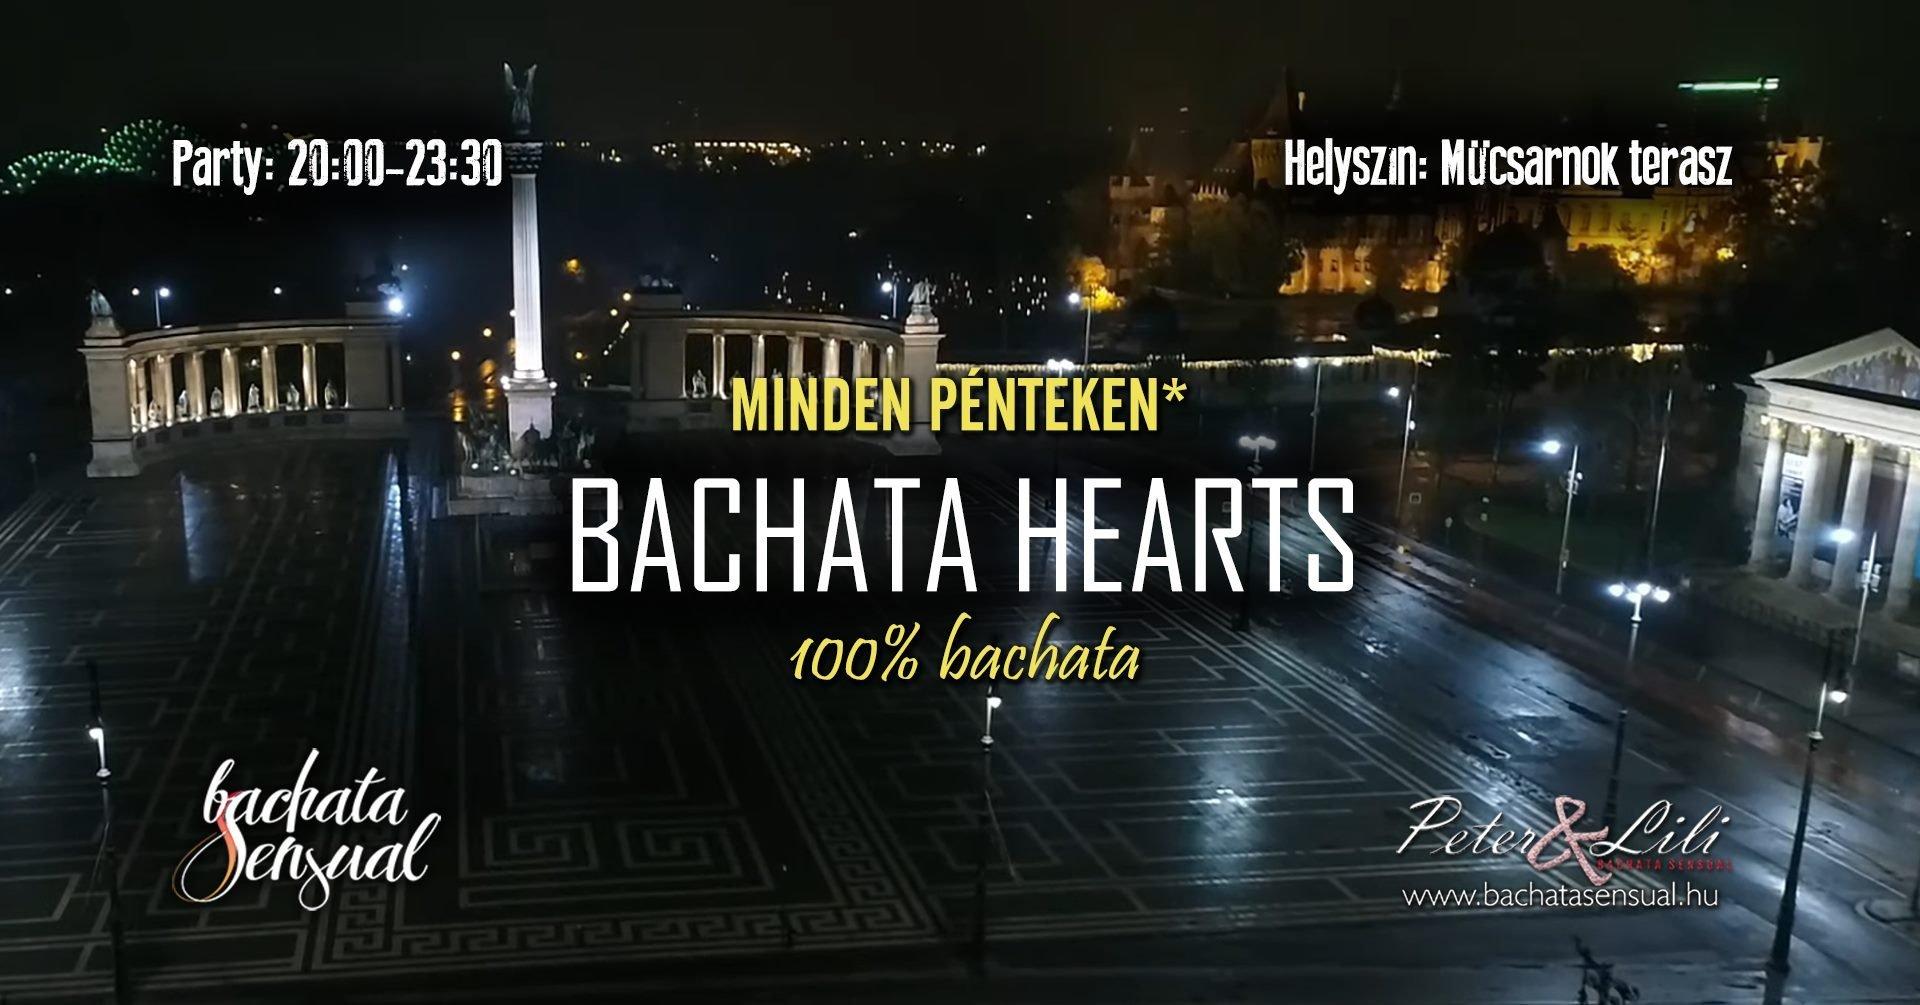 Open air bachata practice